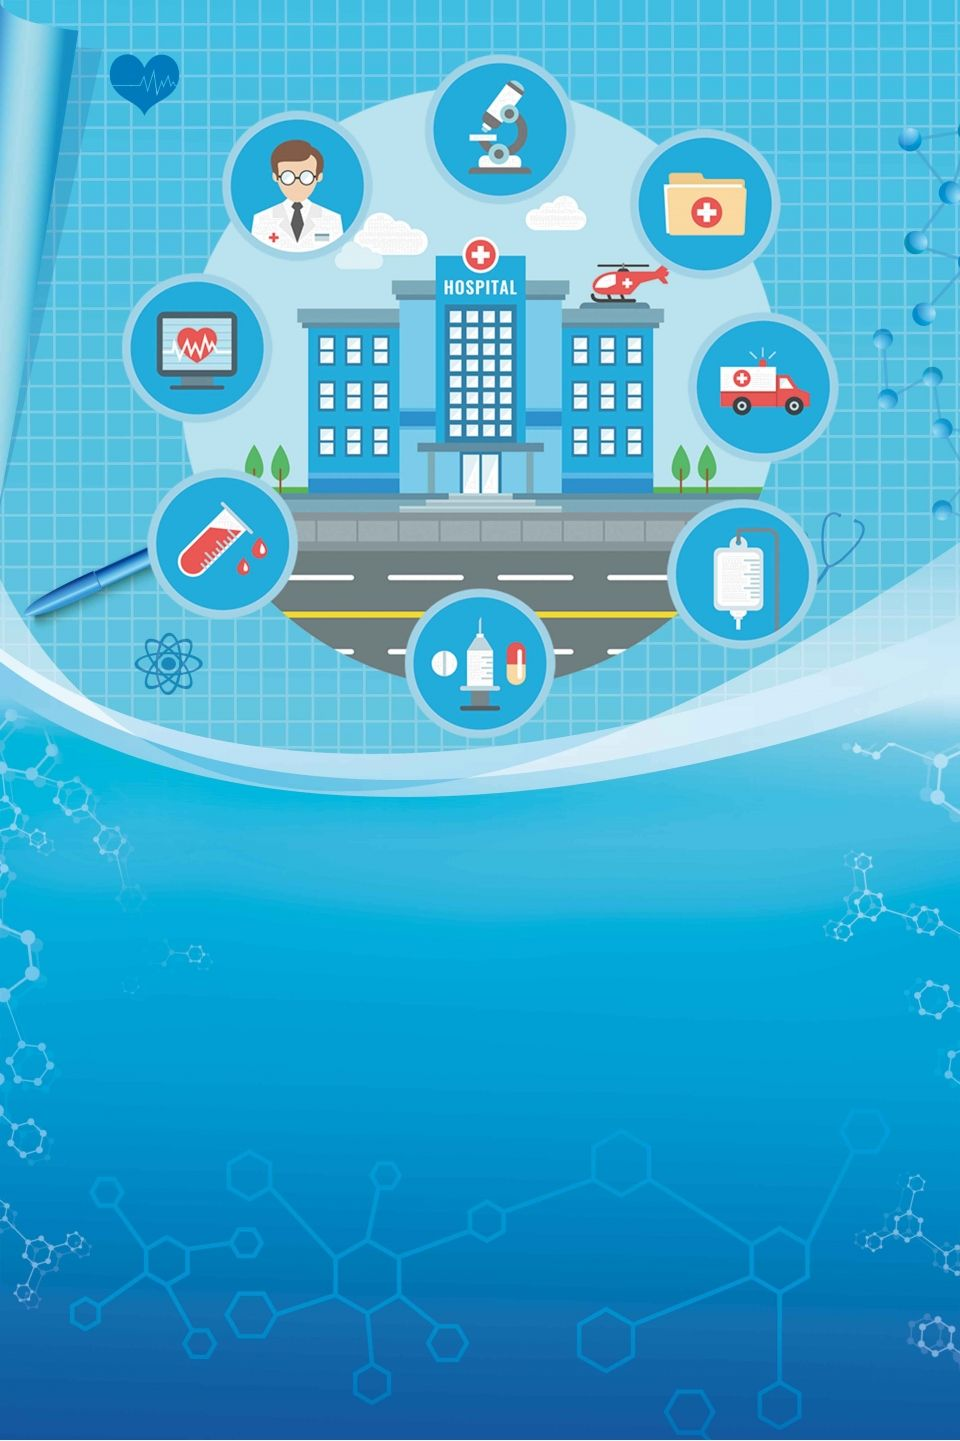 Cartoon Medical Insurance Service ภาพประกอบ